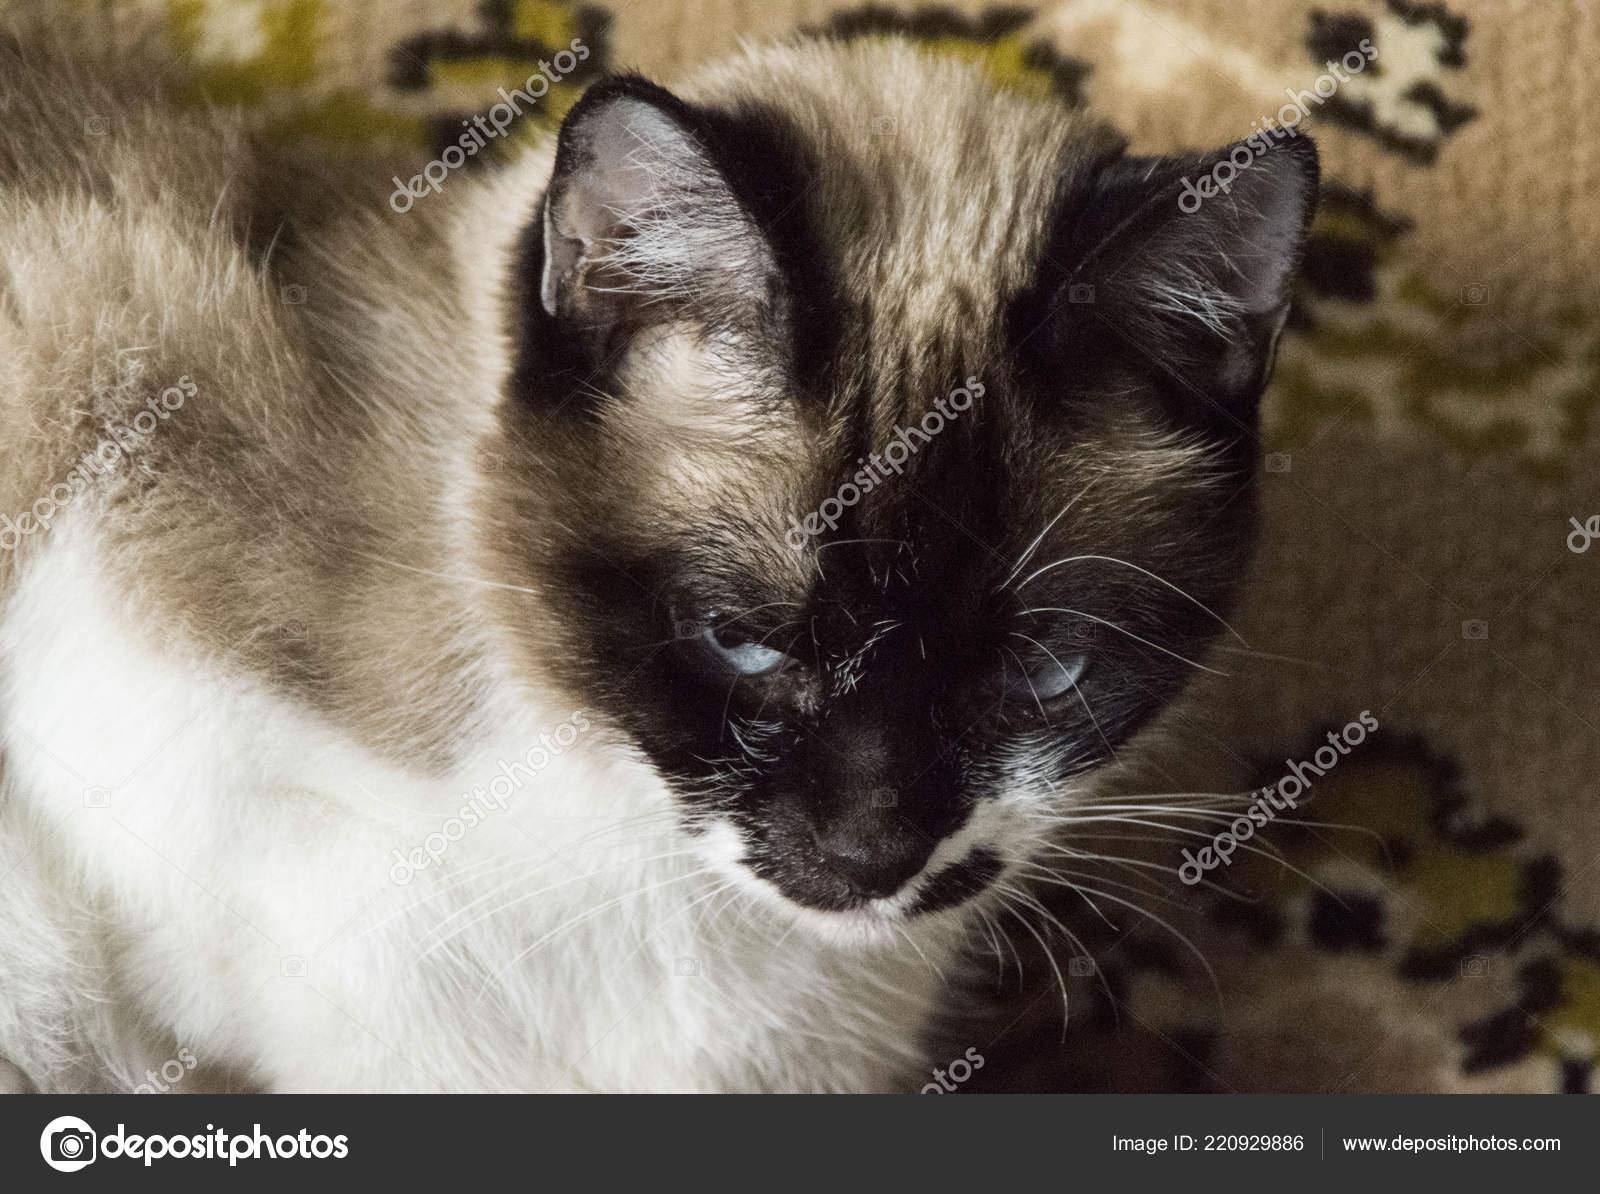 Siamese Cat Purebred Home — Stock Photo © galerylogin #220929886